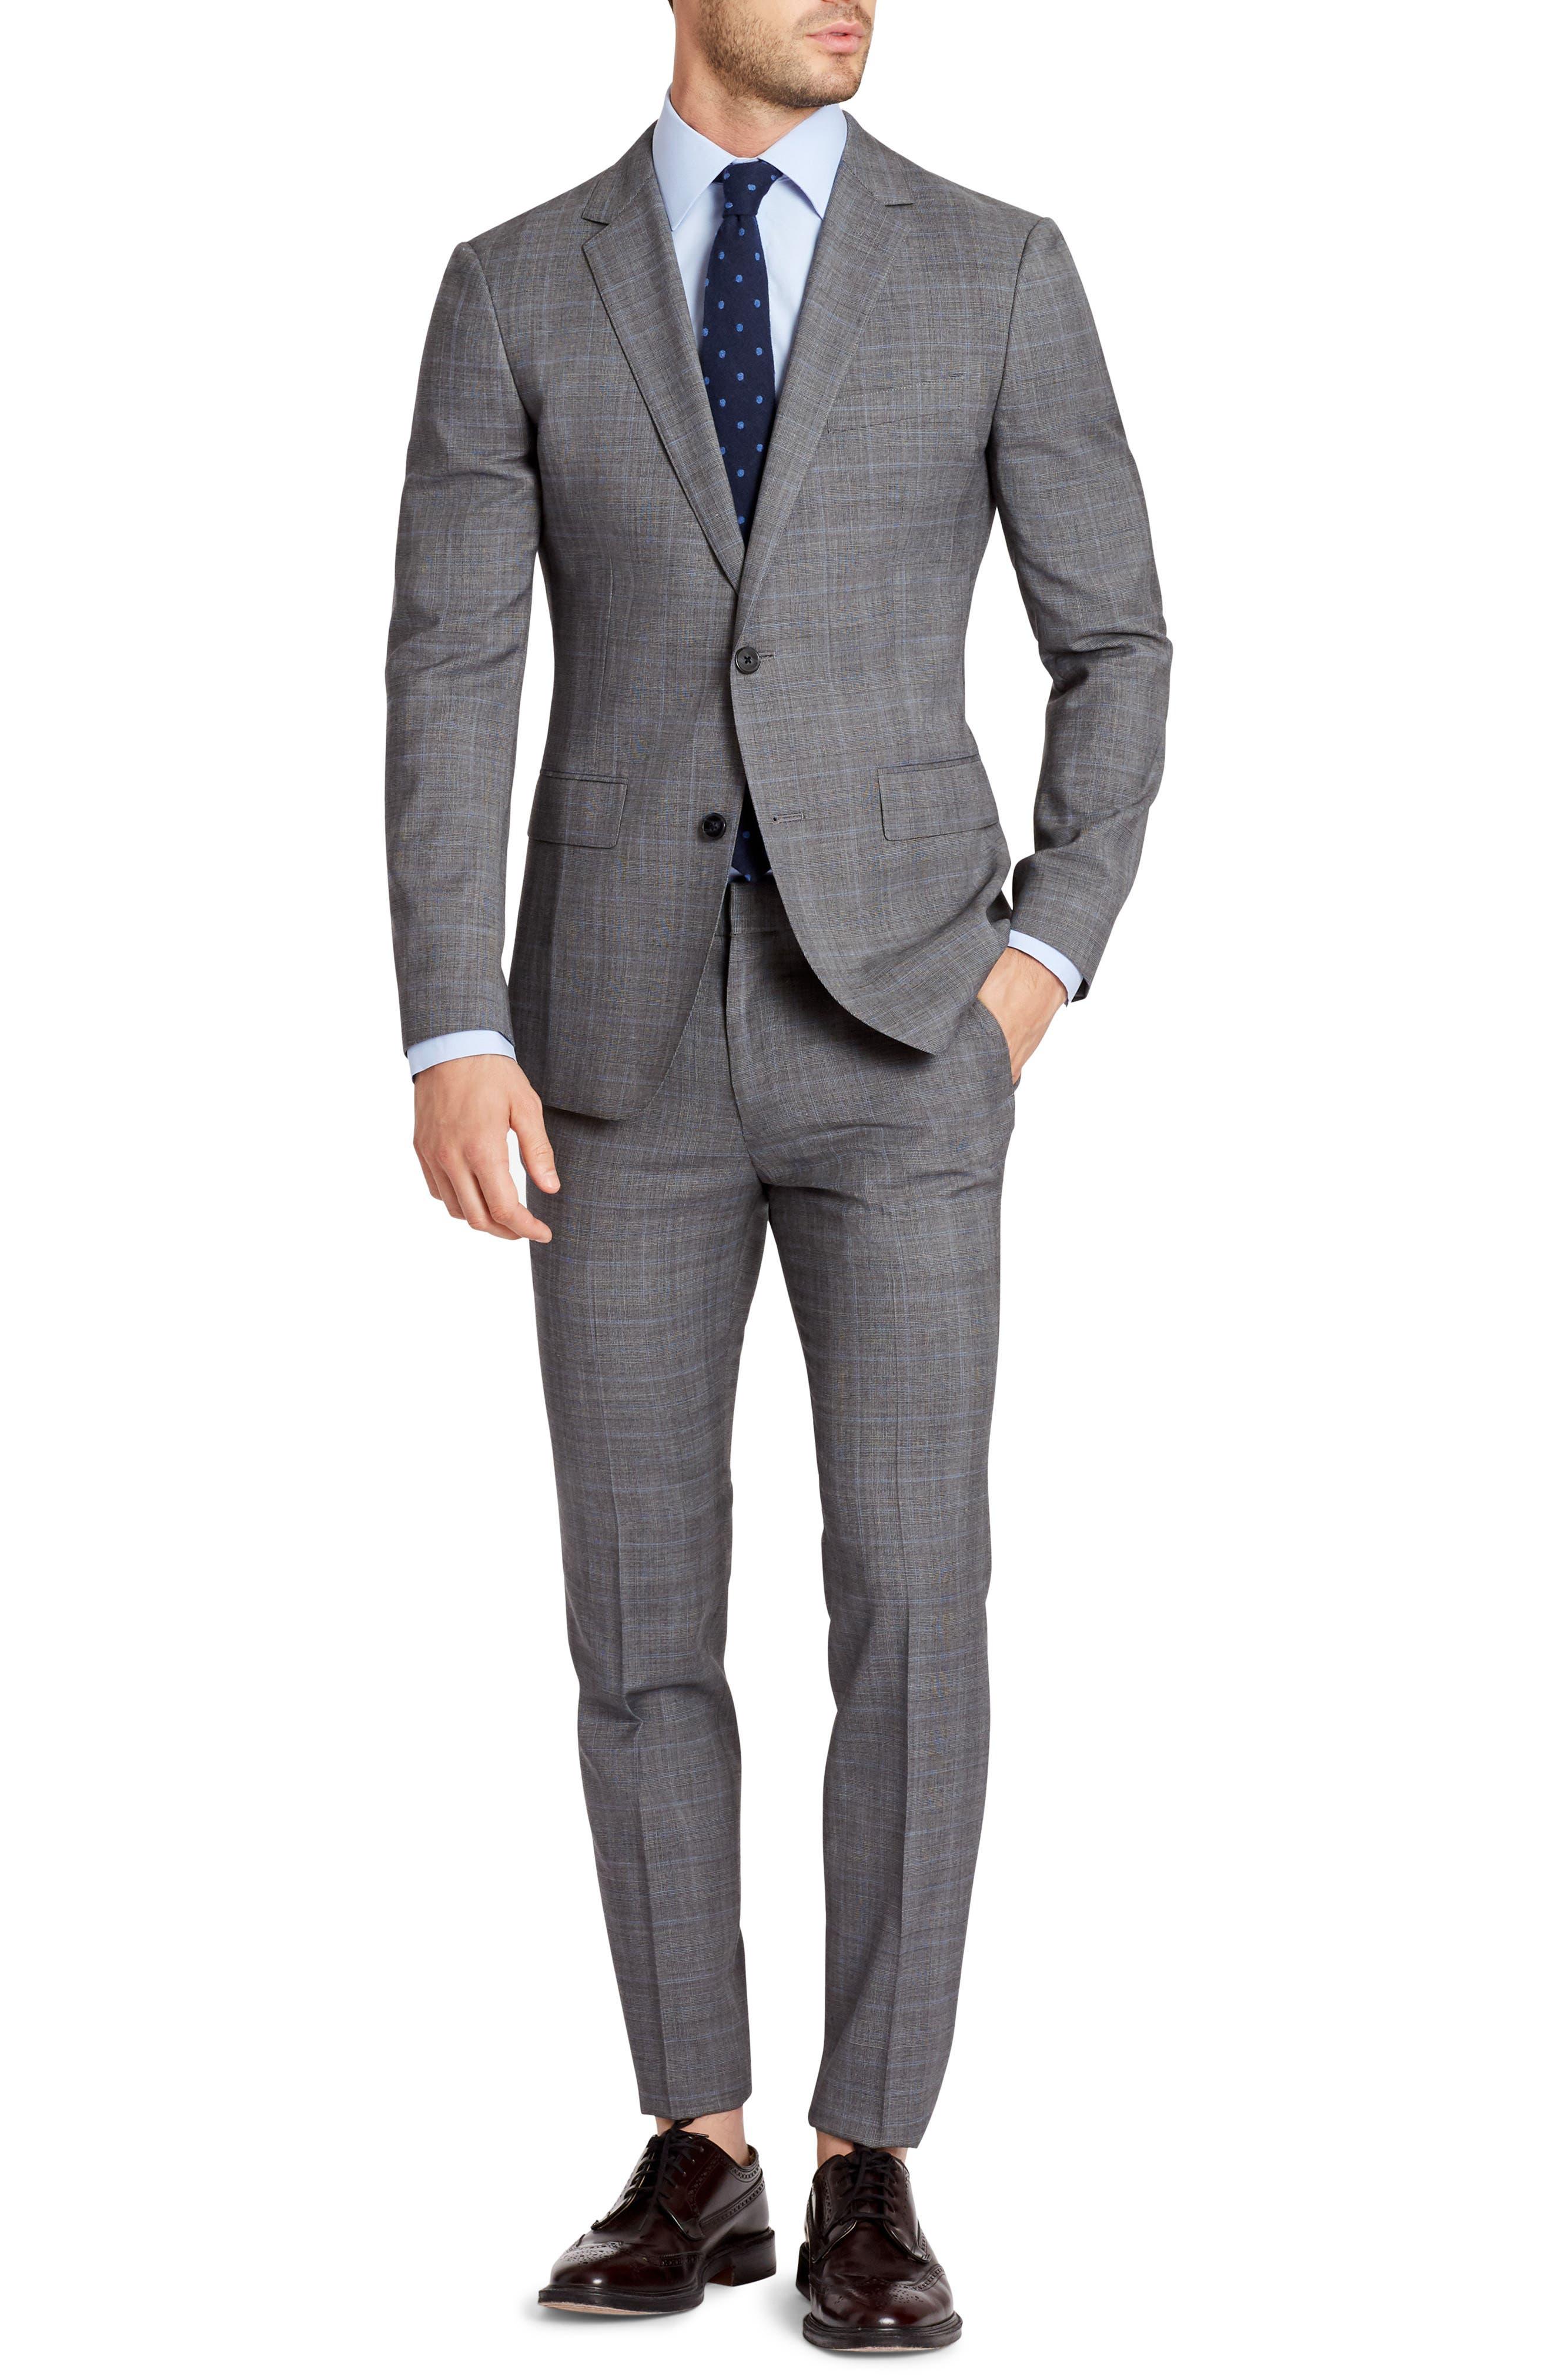 BONOBOS, Jetsetter Flat Front Plaid Stretch Wool Trousers, Alternate thumbnail 4, color, 020